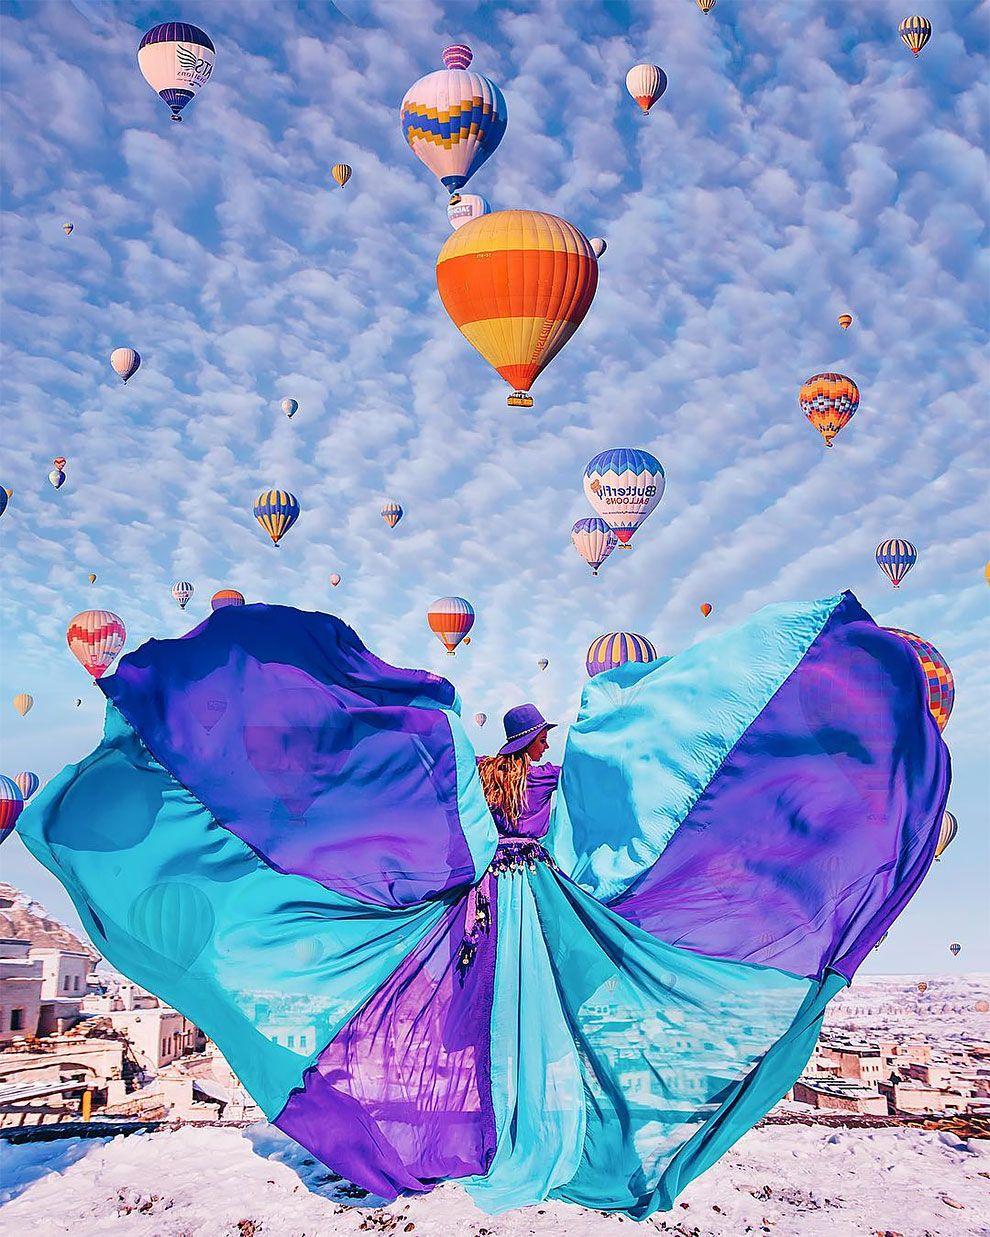 Unreal Hot Air Balloons Captured In Cappadocia Turkey Balloons Show Beauty Fashion Photography